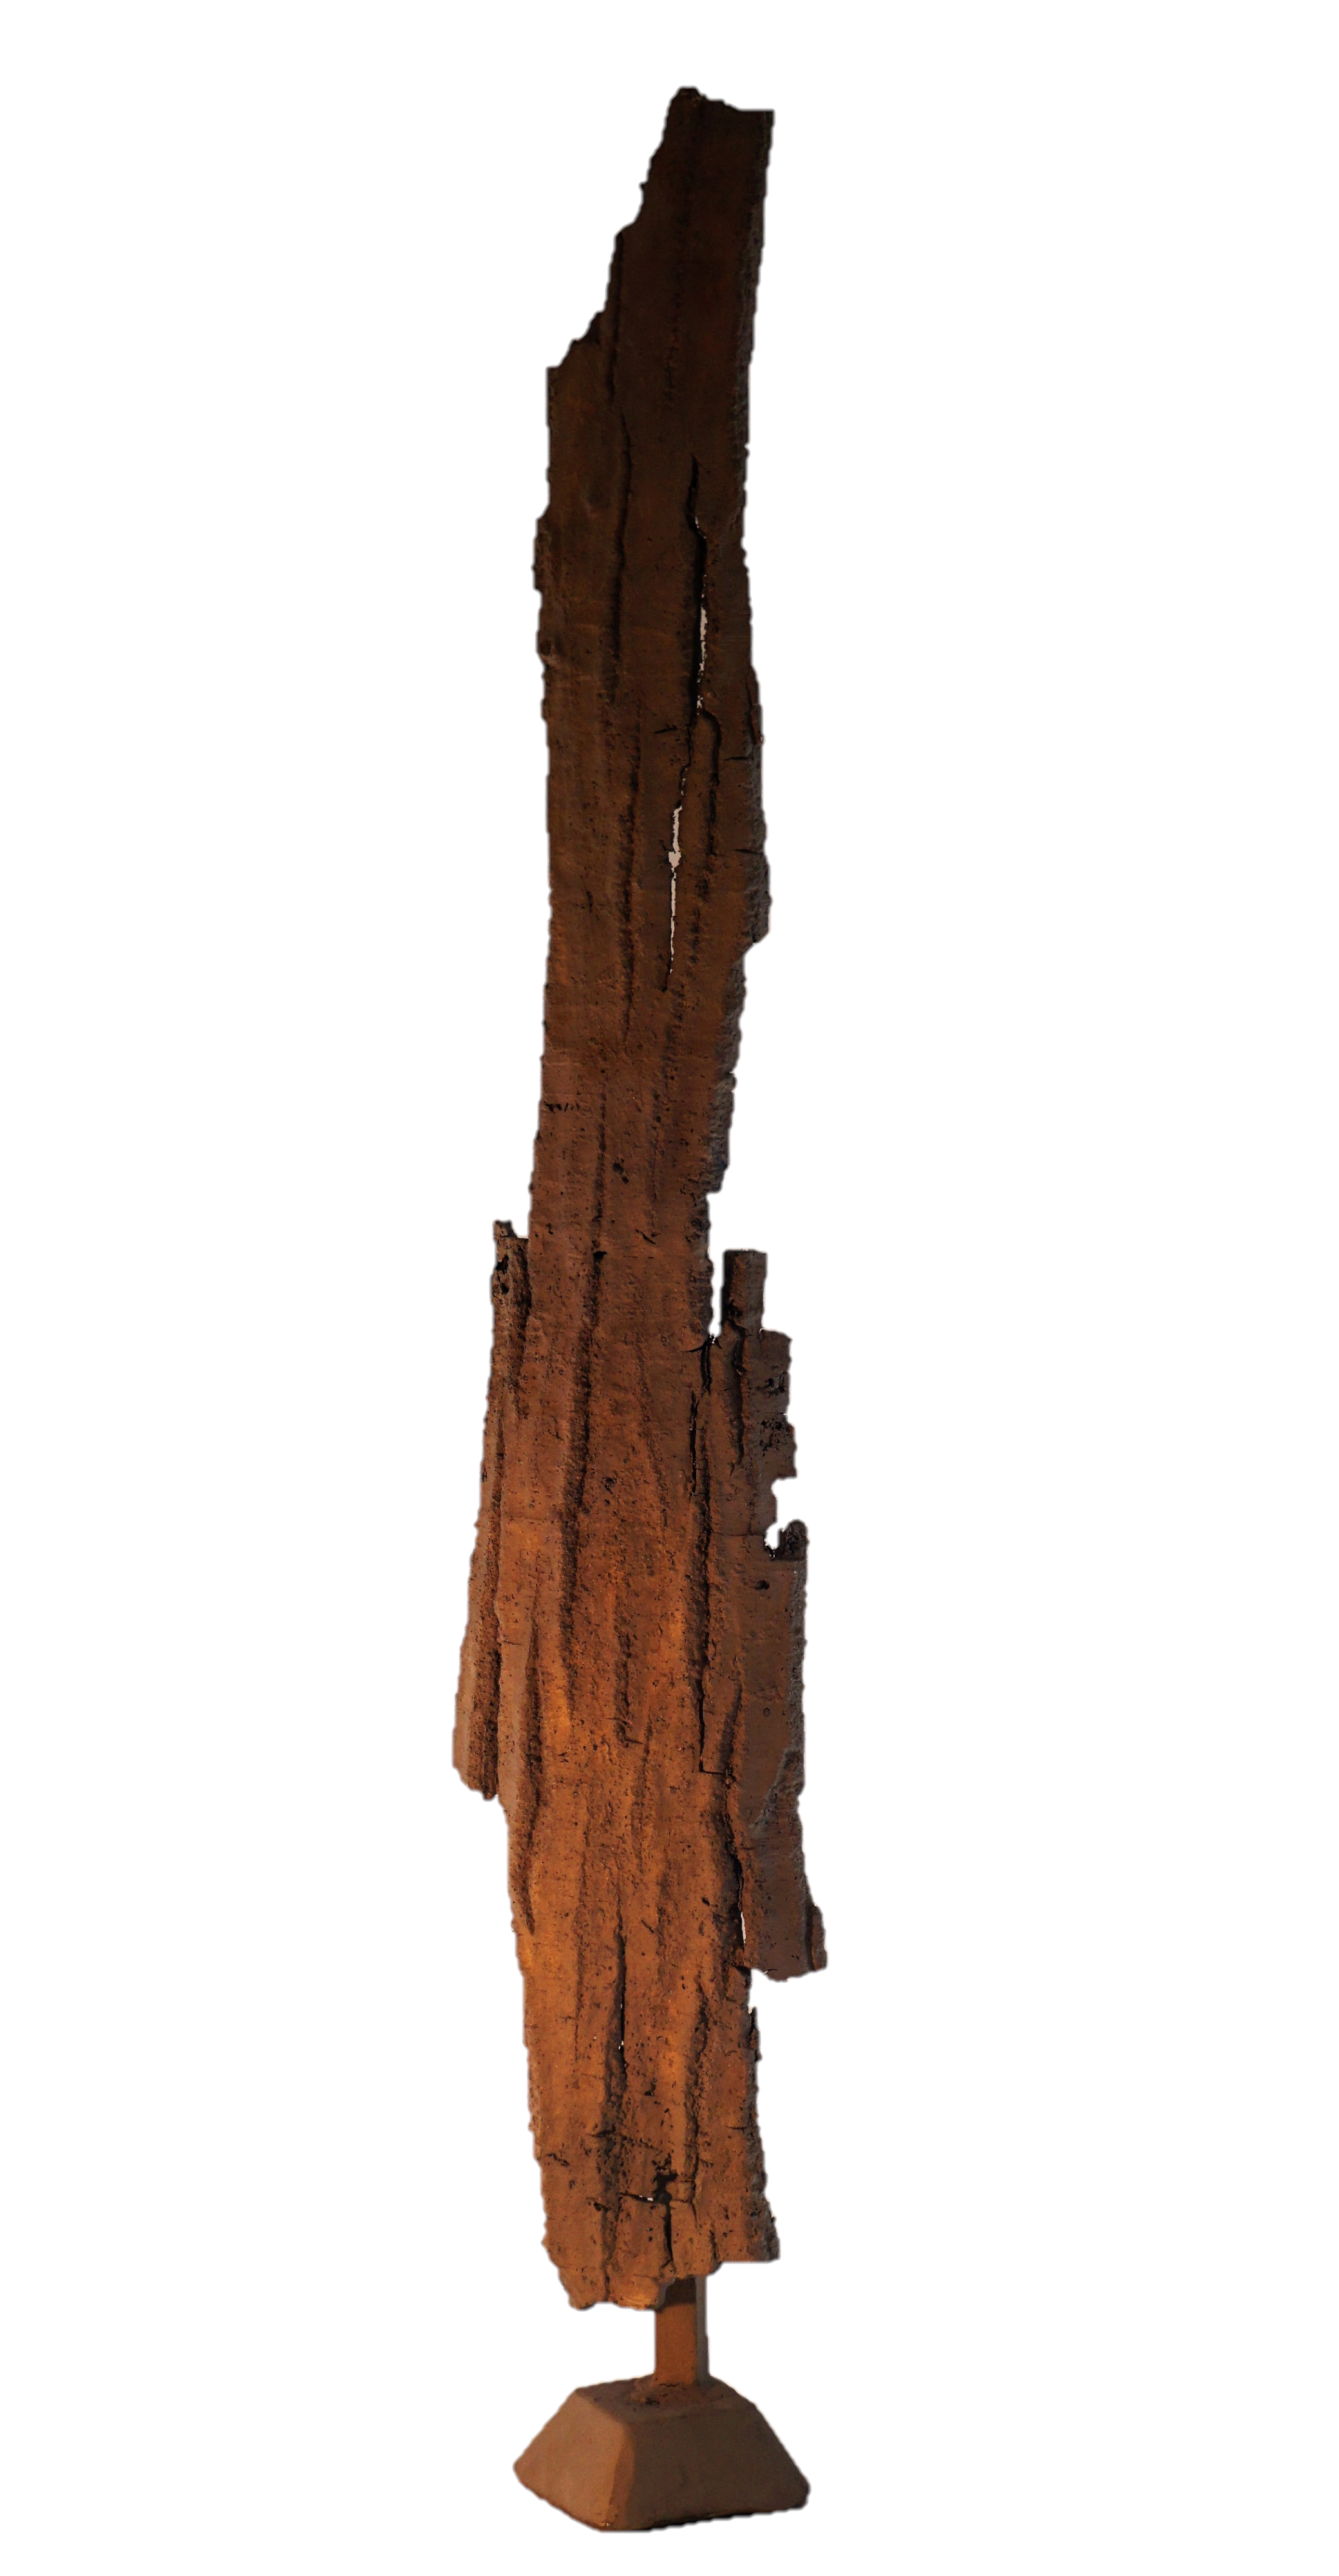 Bark #19